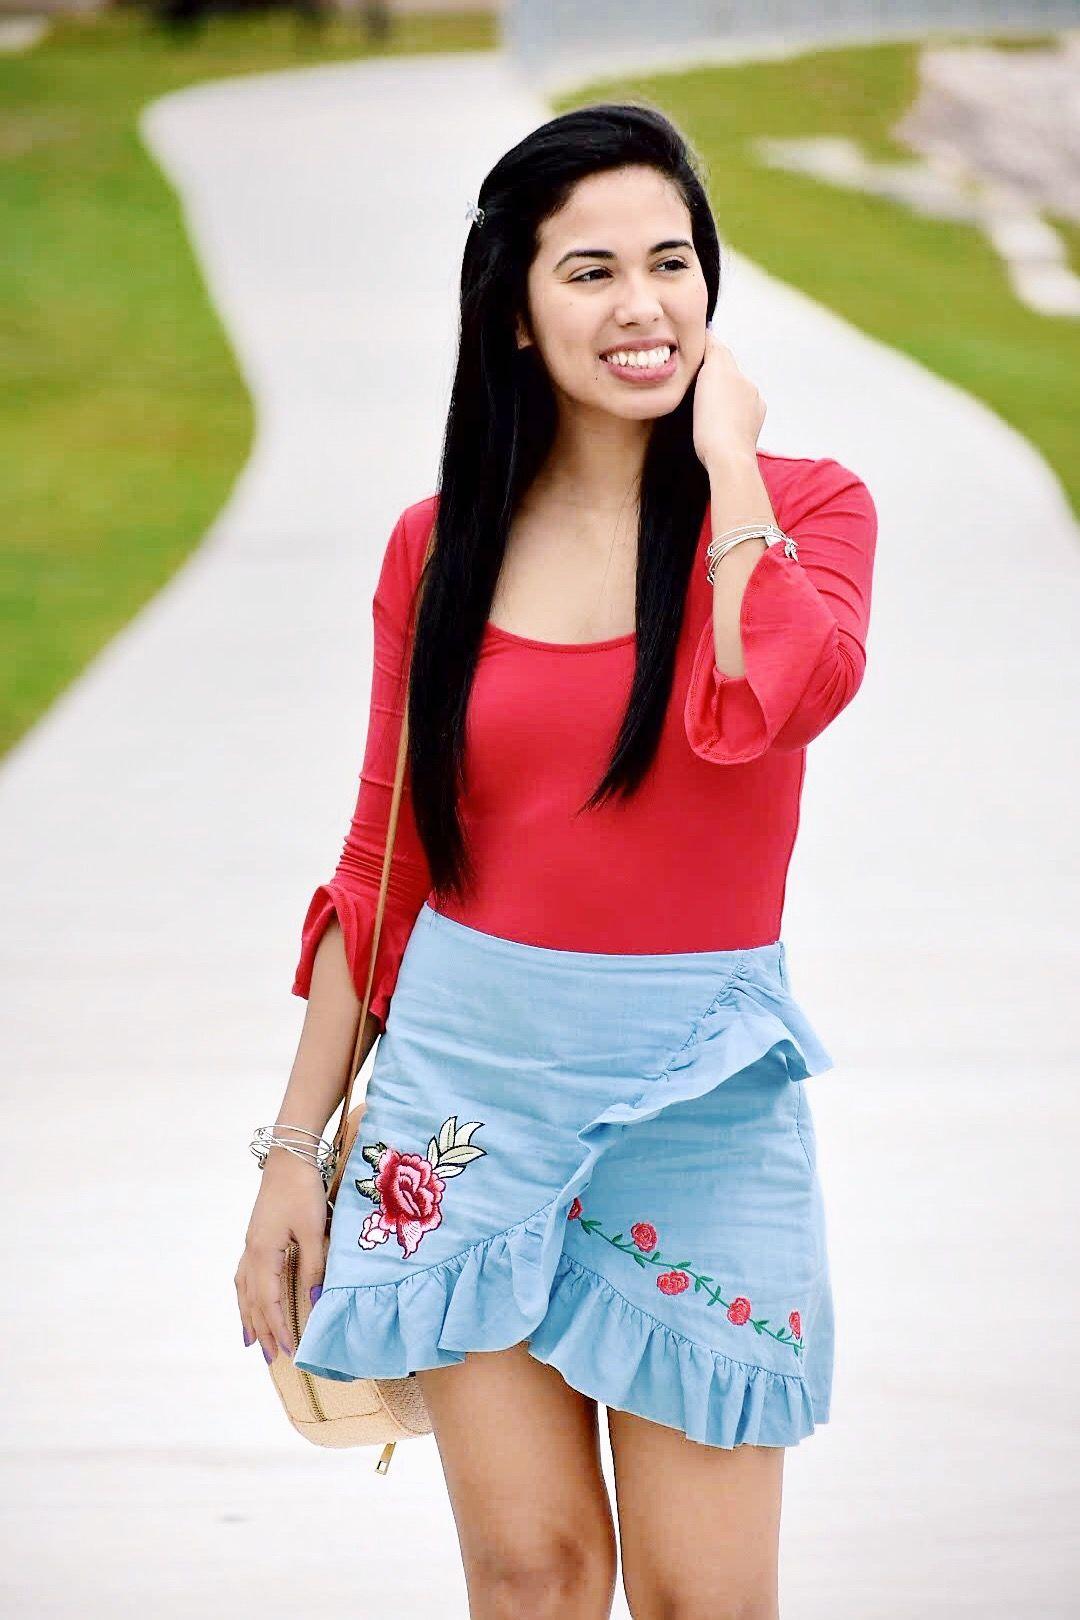 Chambray Rose Patch Skirt     March 14 , 2018    trendycitrus.wordpress.com    #chambrayskirt #redandblue #redbodysuit #springlook    XOMandySue code: Jessica35 for 35% off on xomandysue.com